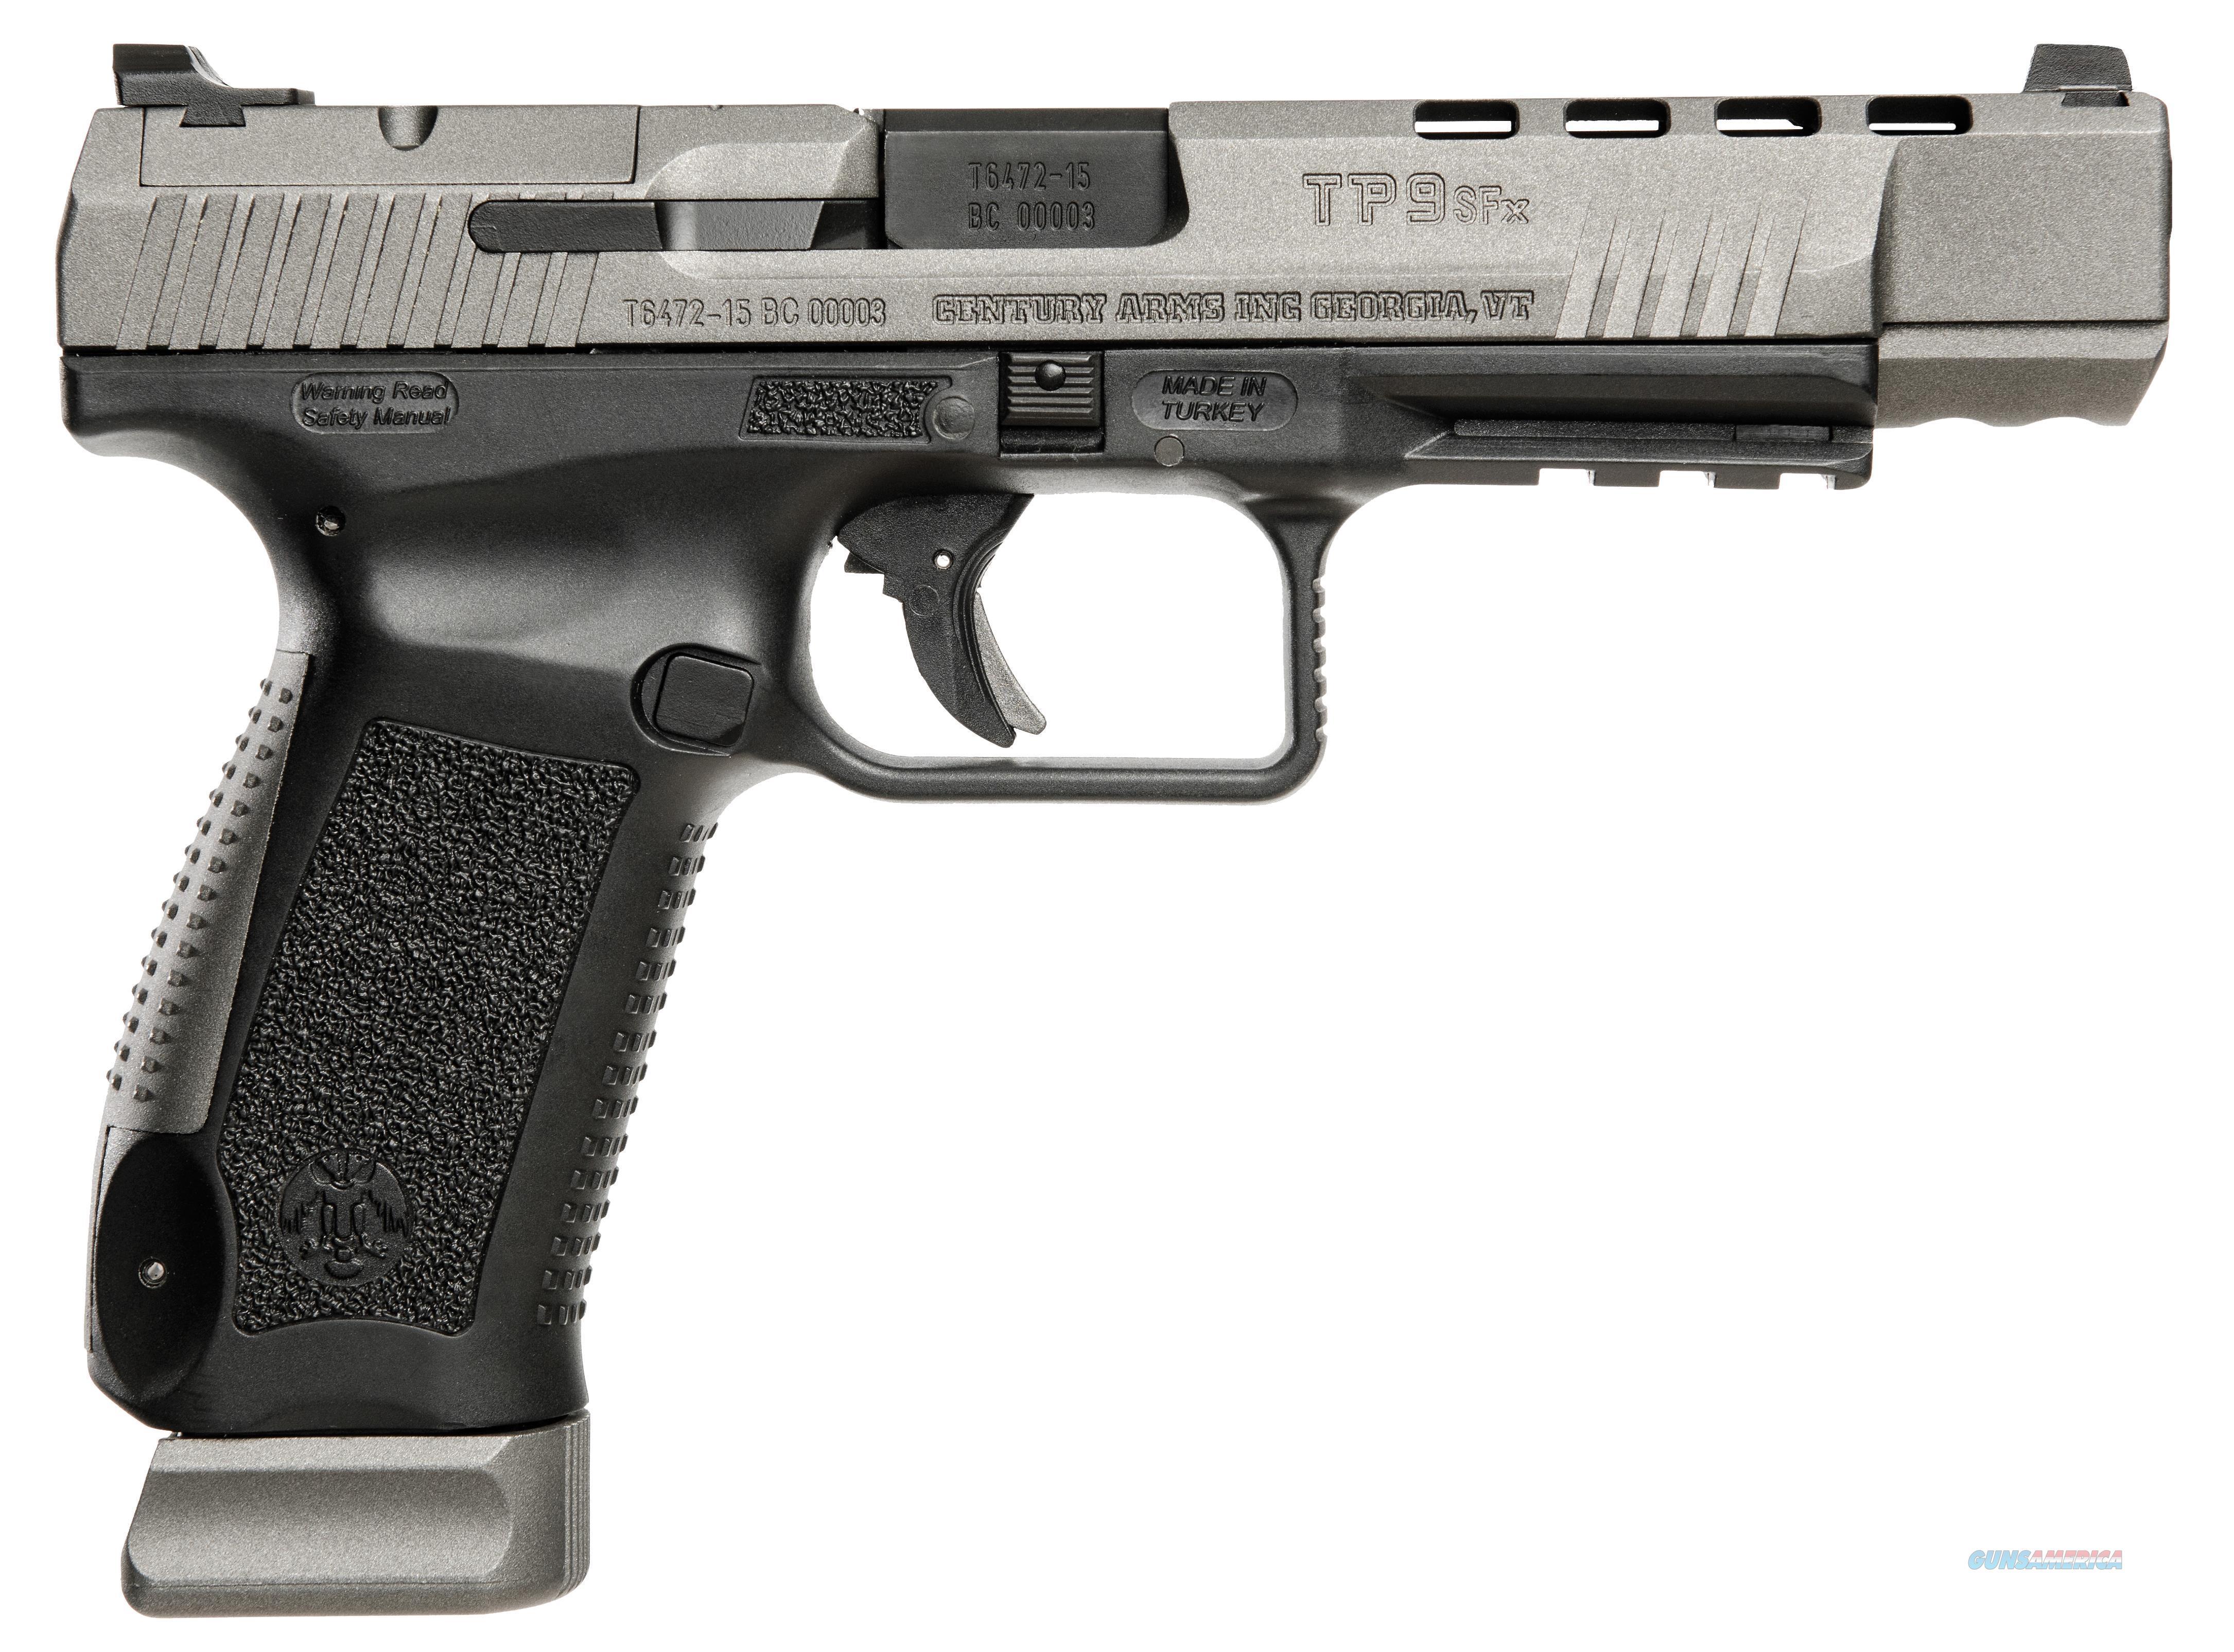 Canik   Tp9sfx 9Mm Gray Blk Warren Sights HG3774G-N  Guns > Pistols > Canik USA Pistols